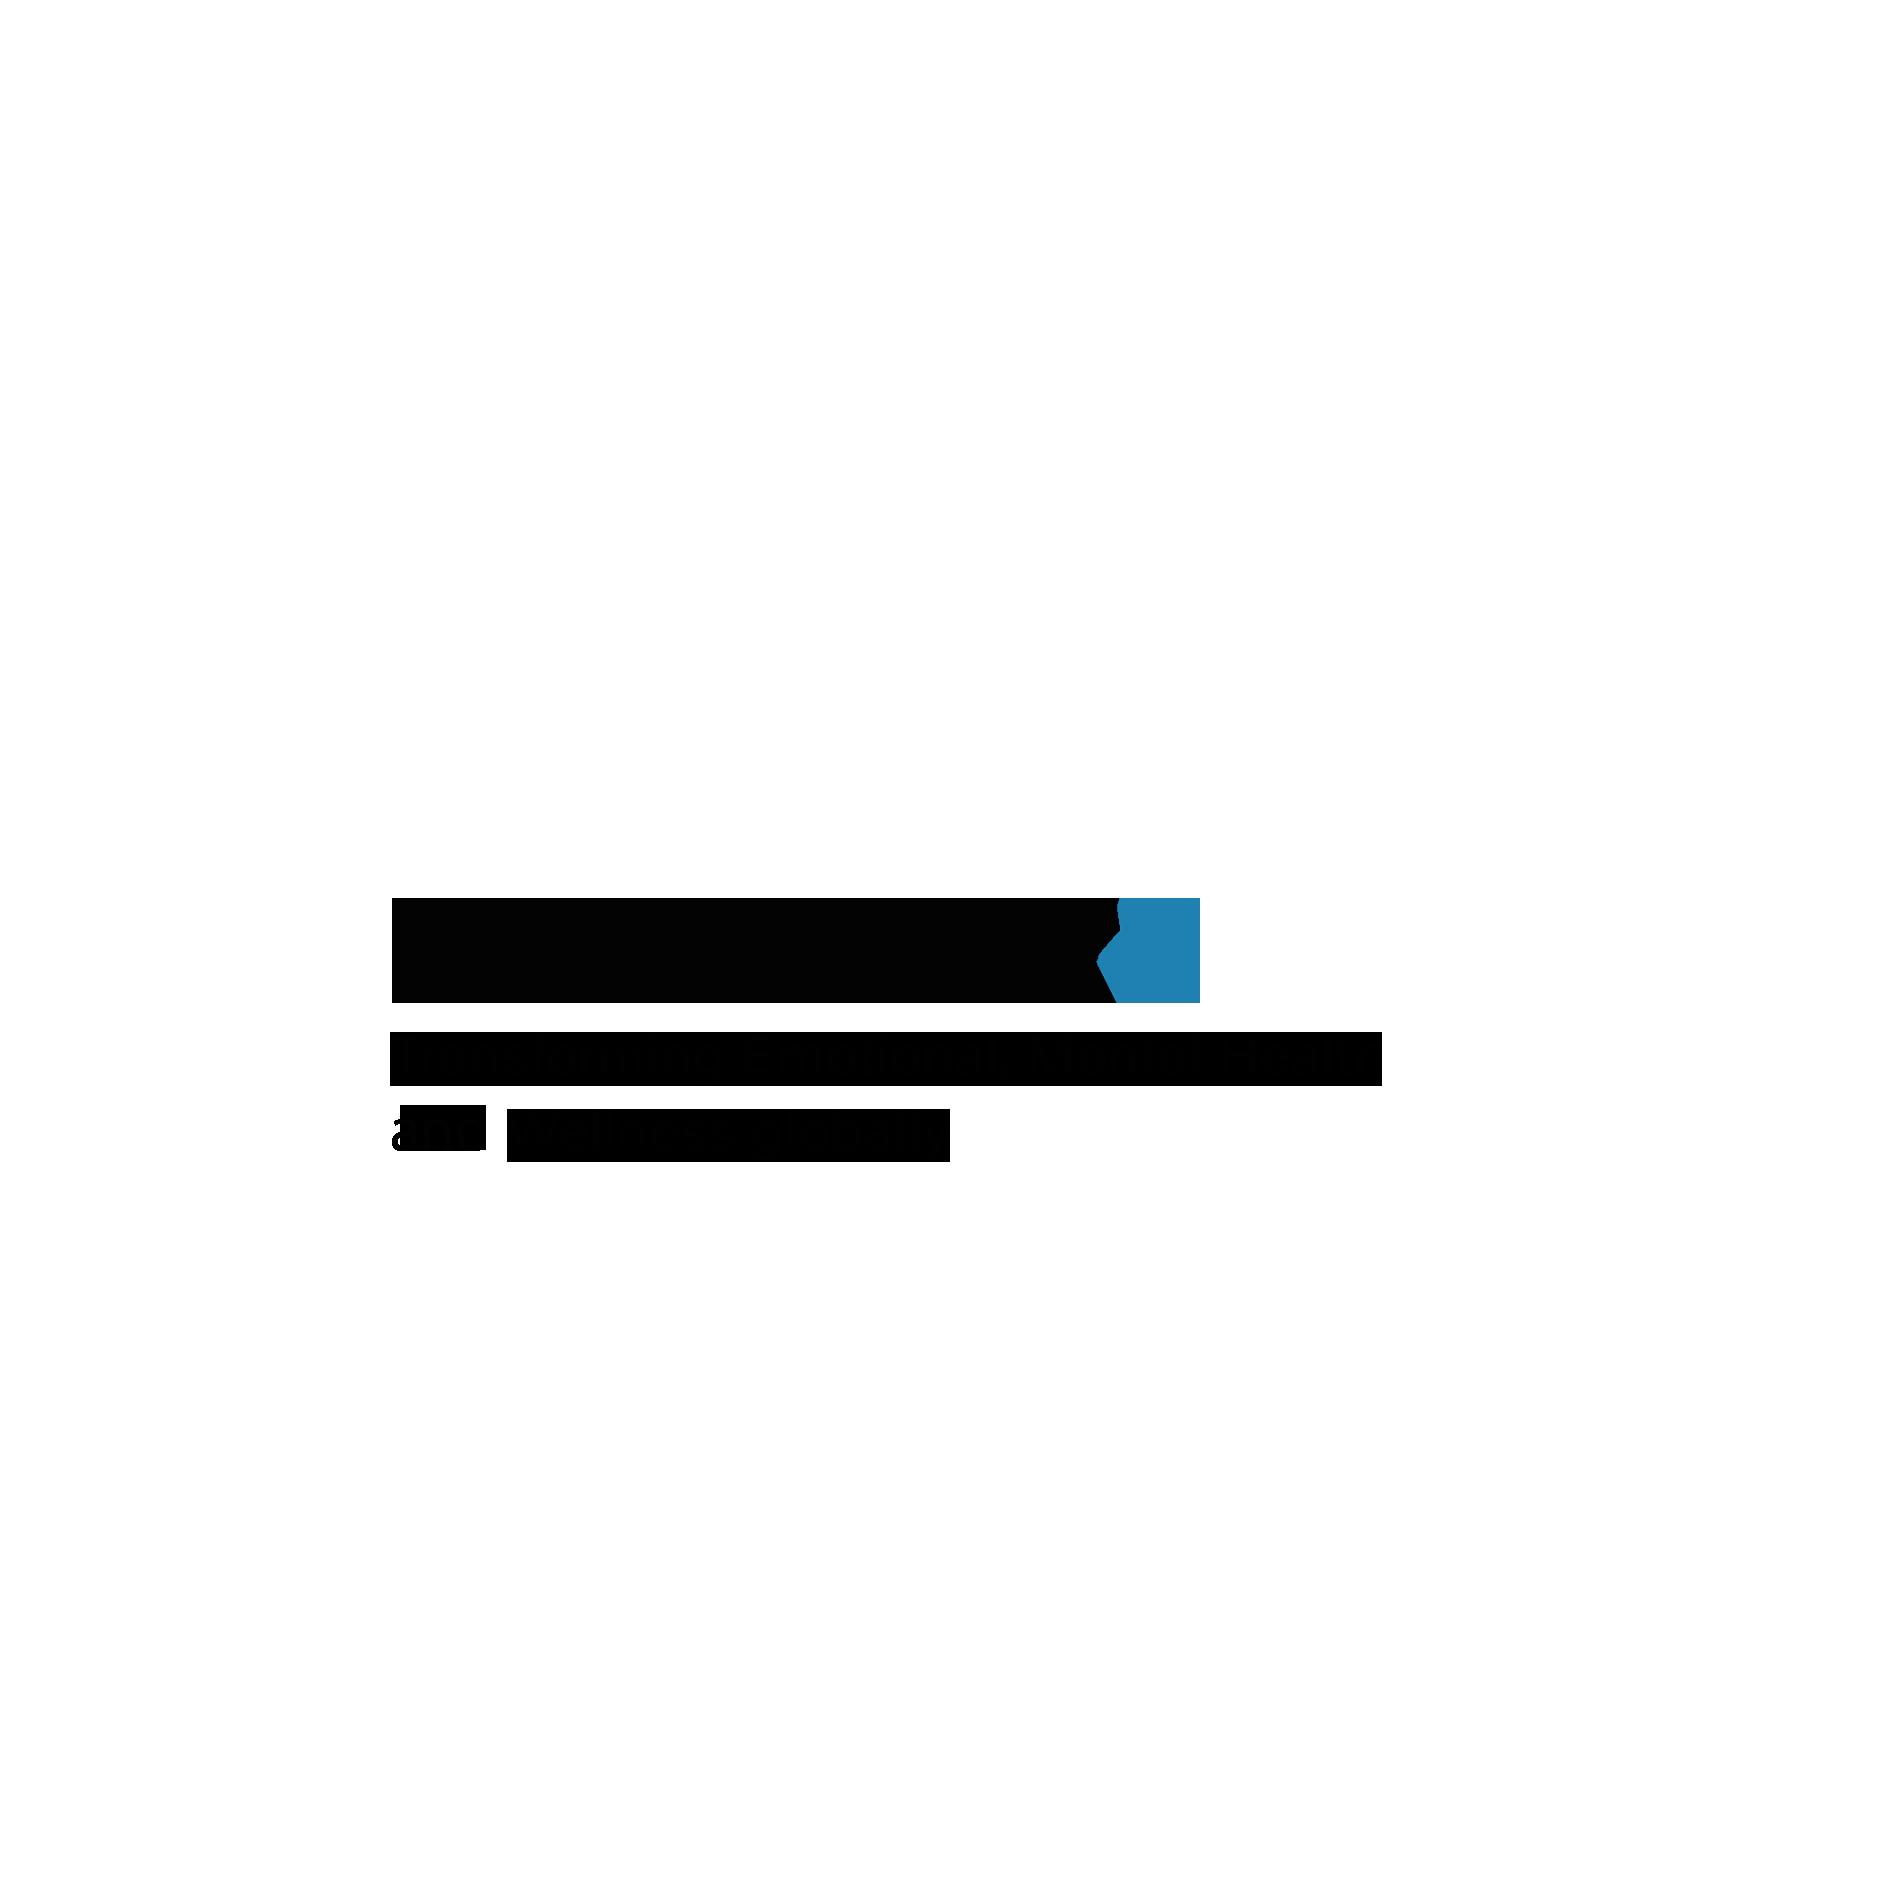 pacifyr01 final png